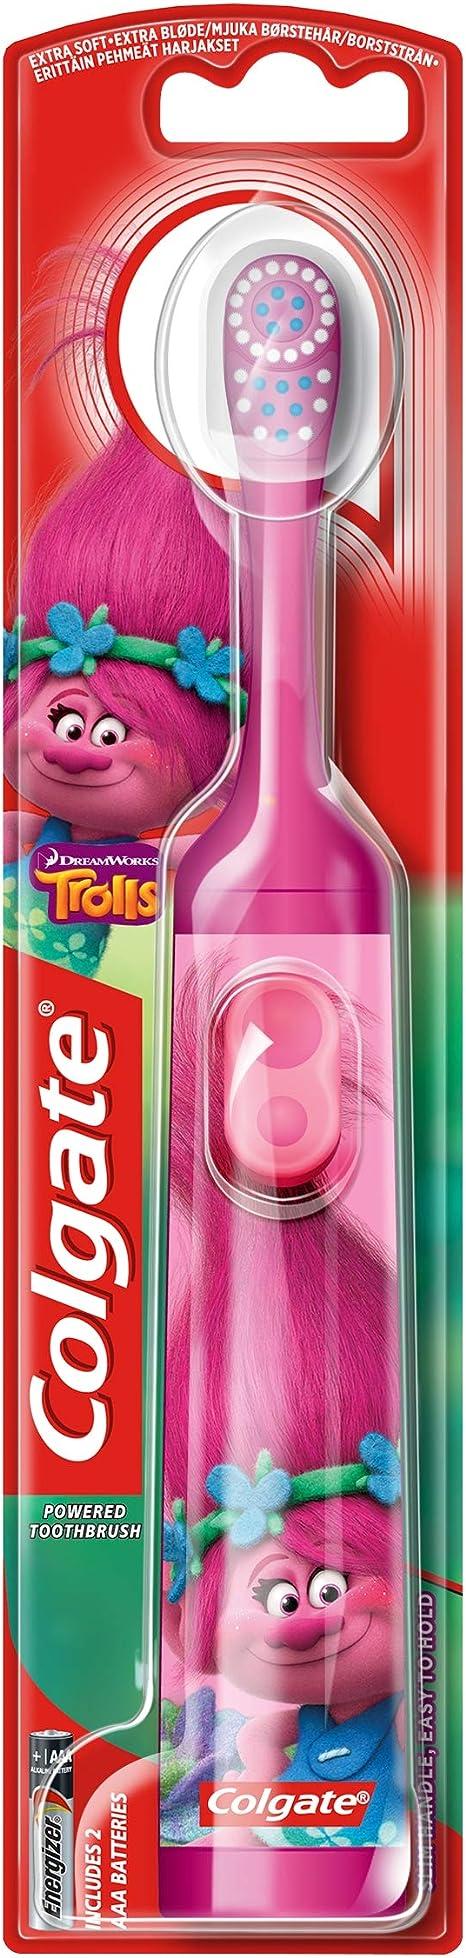 Colgate Kids Trolls Extra Soft Battery Toothbrush 3+ Years